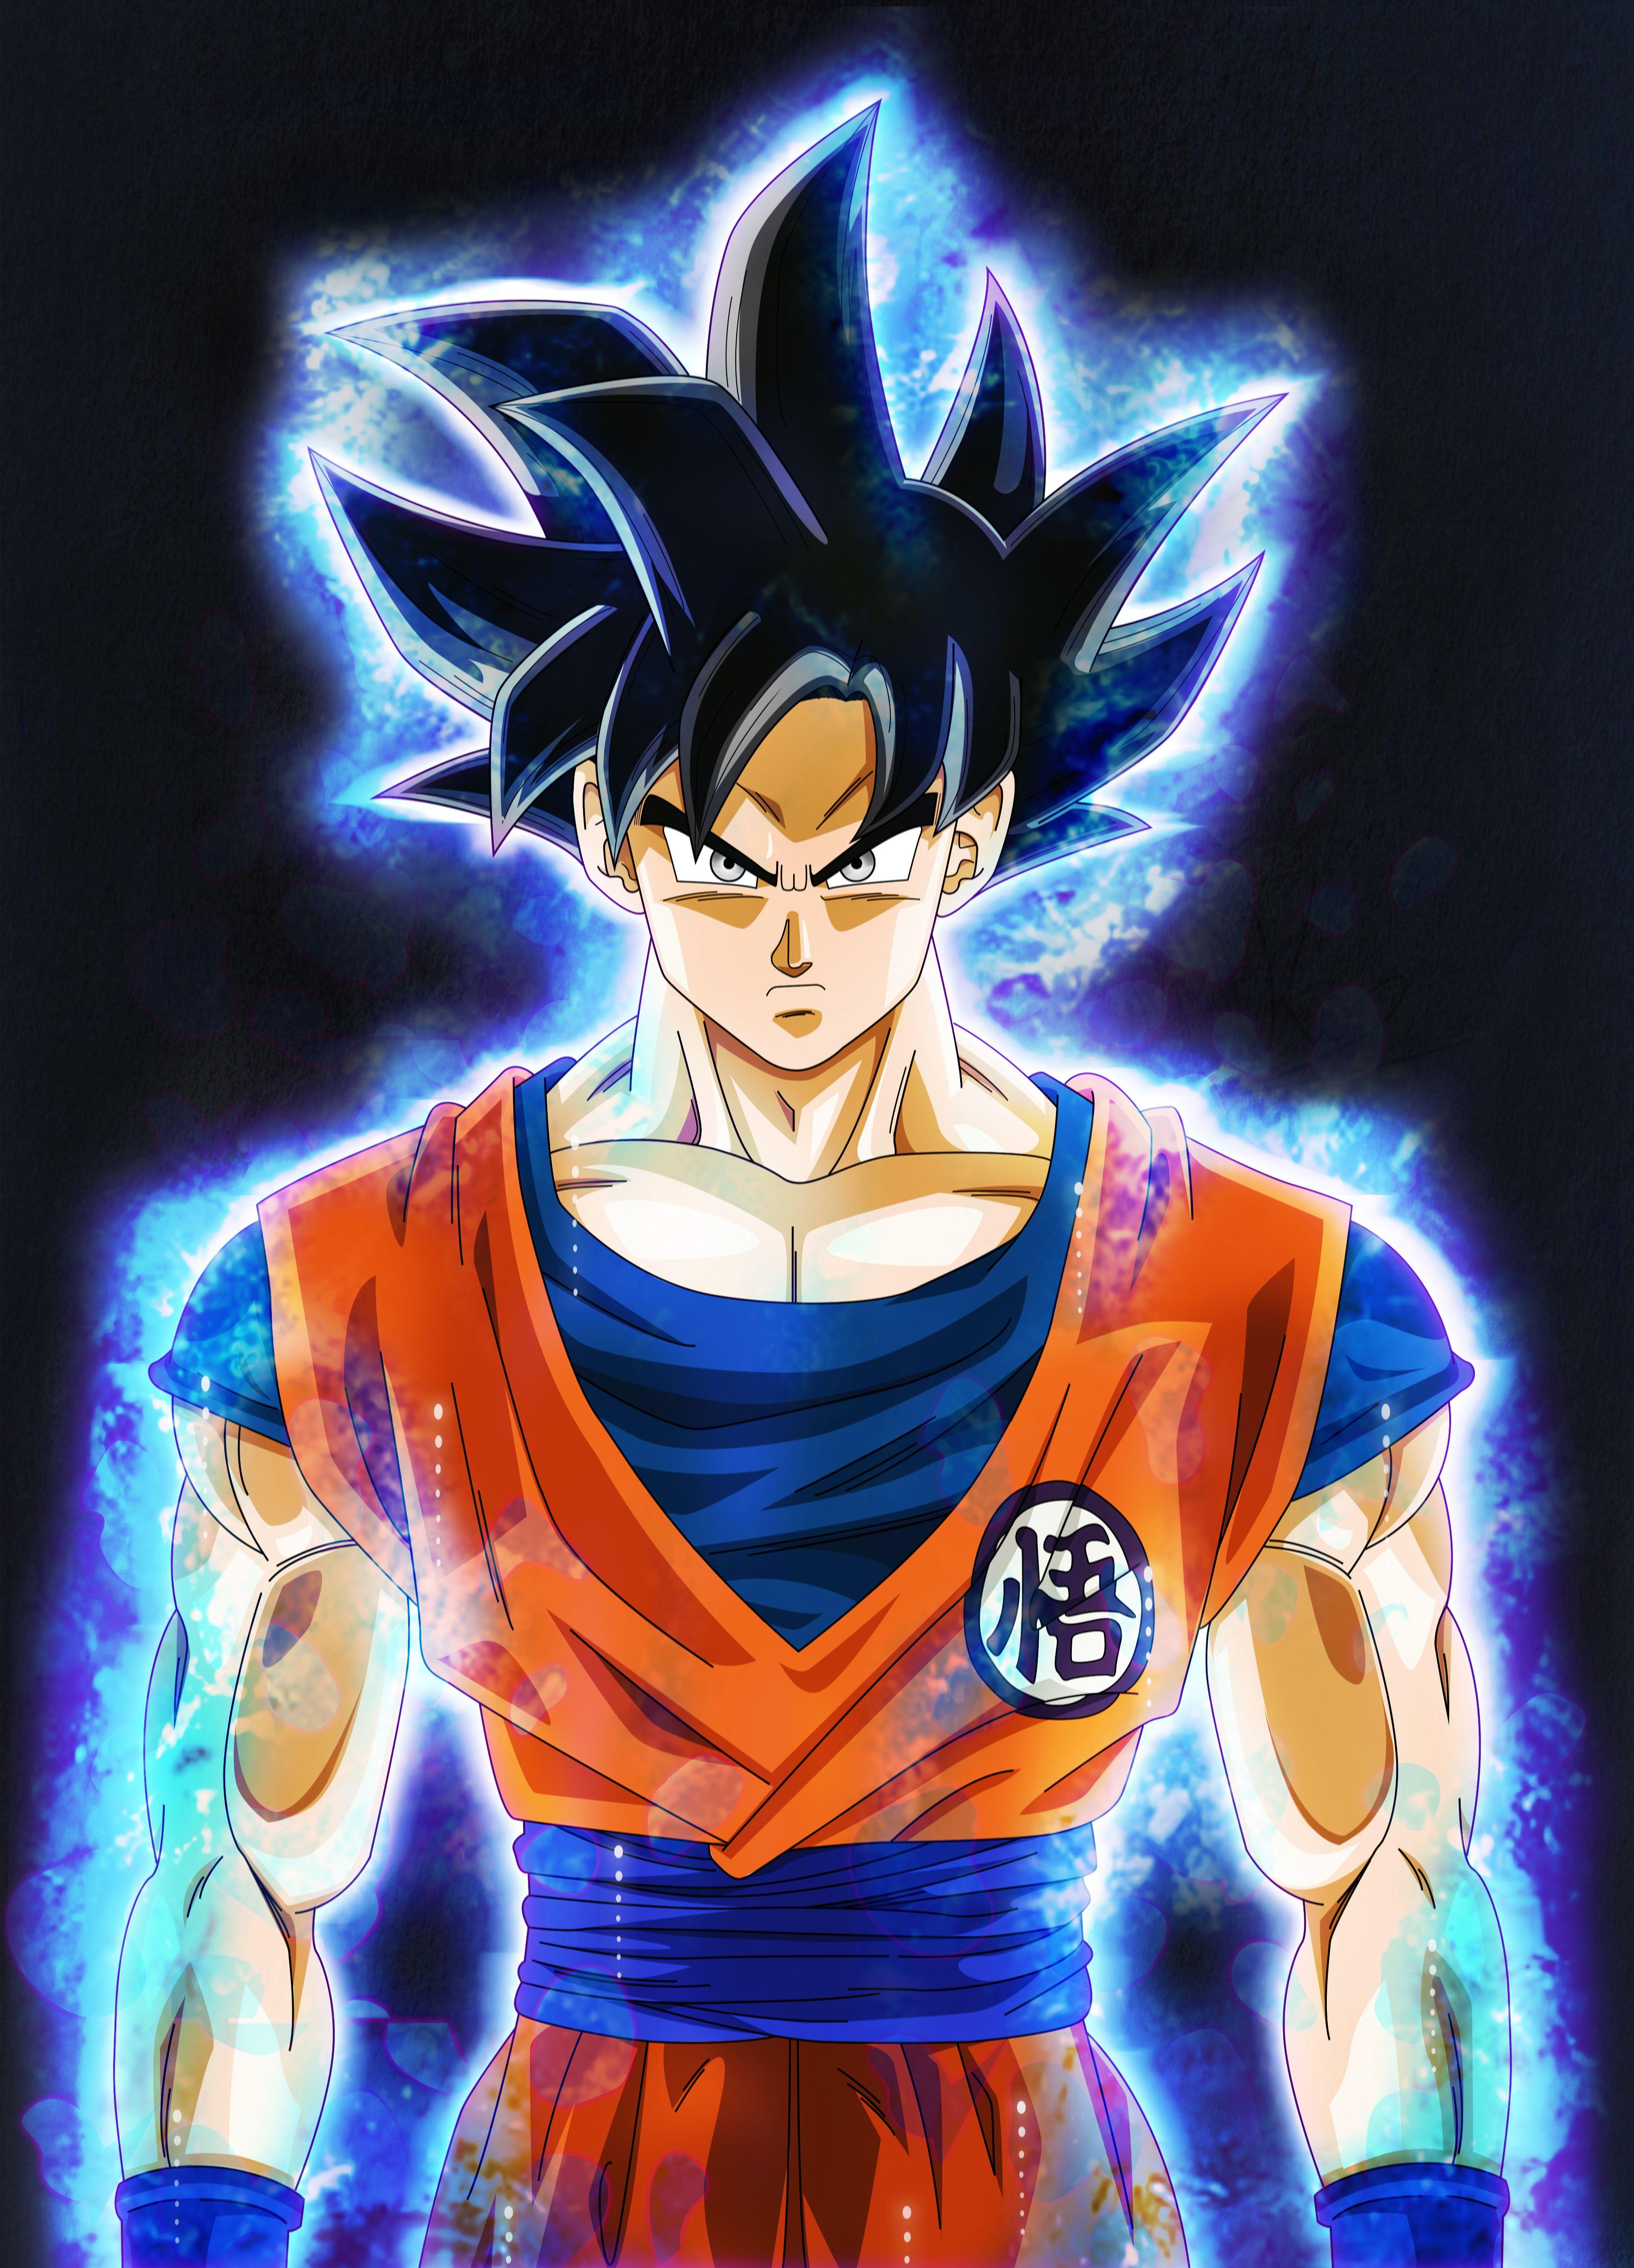 Migatte No Gouki Dragon Ball Super Manga Dragon Ball Artwork Anime Dragon Ball Super